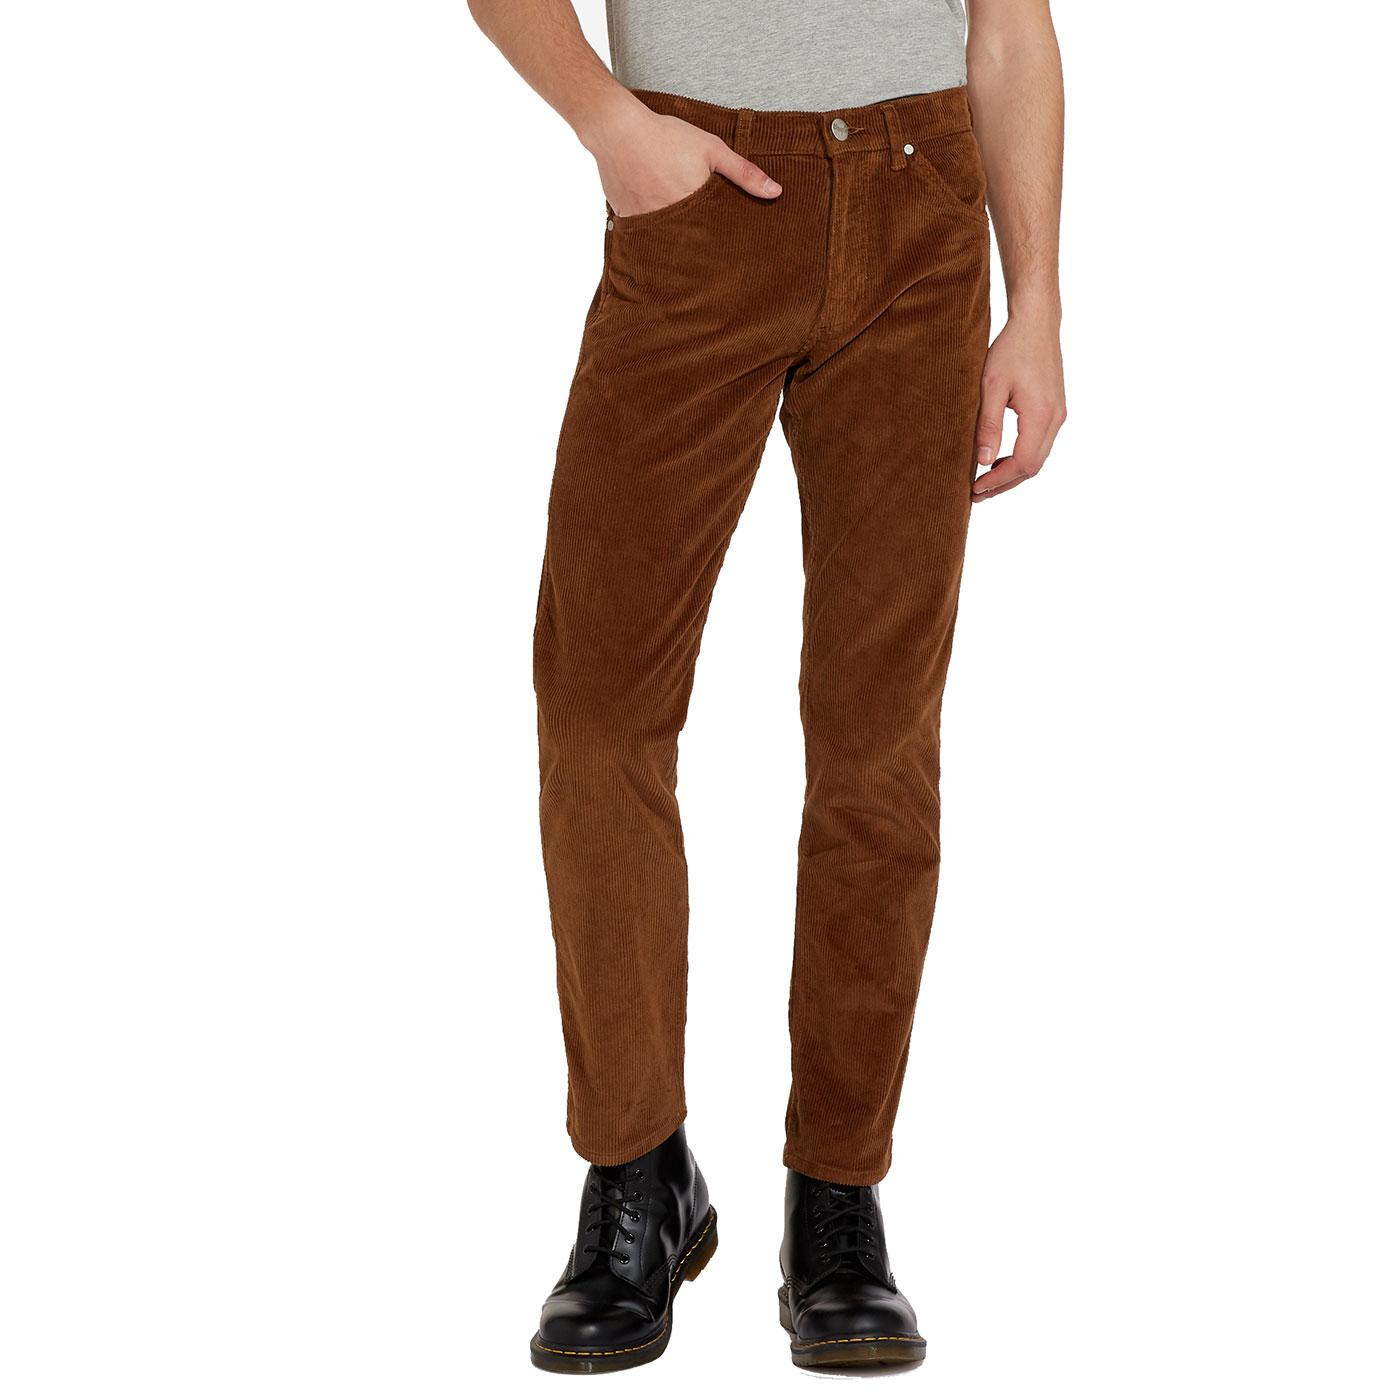 Greensboro WRANGLER Retro Straight Leg Cord Jeans